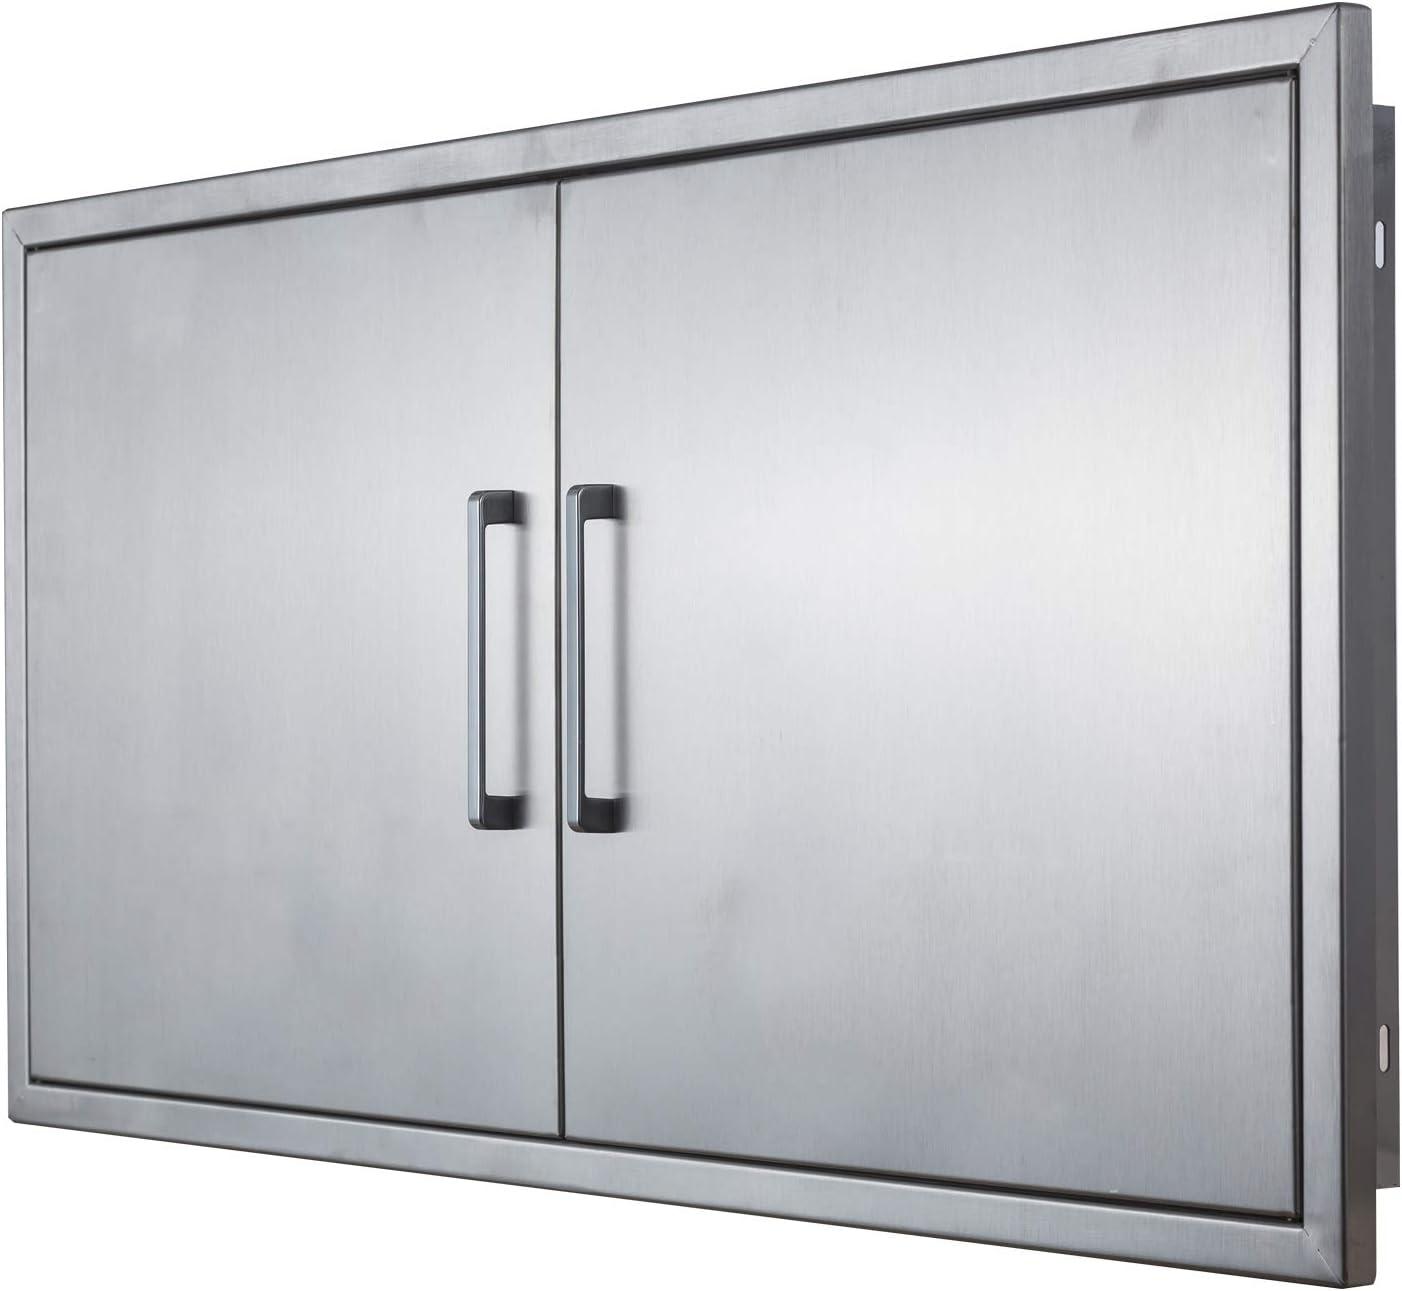 Amazon Com Outdoor Kitchen Doors 42 W X 21 H Stainless Steel Bbq Double Access Door Flush Mount For Outdoor Kitchen And Bbq Island Garden Outdoor